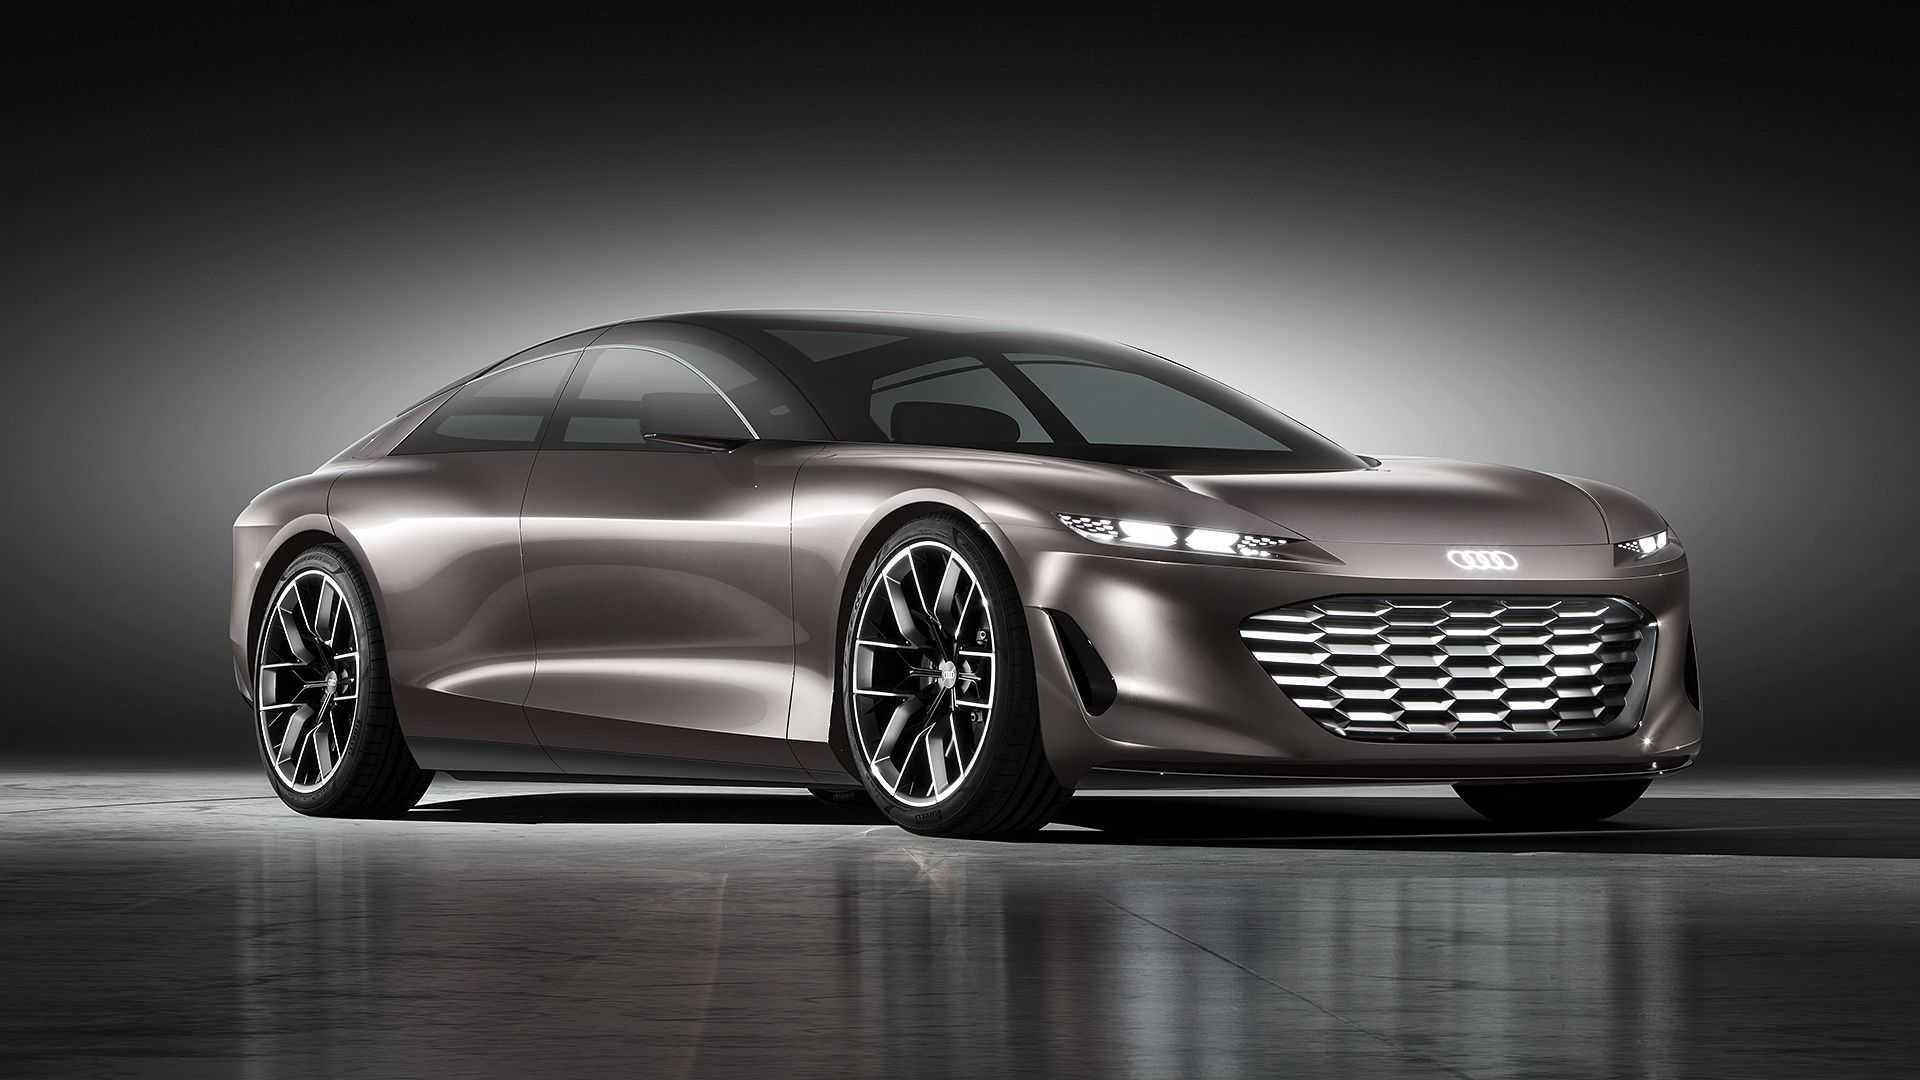 2021 - [Audi] Grand Sphere  ?c=1&o1=ro&url=https%3A%2F%2Fcdn.motor1.com%2Fimages%2Fmgl%2F6n64l%2Fs1%2Faudi-grandsphere-concept